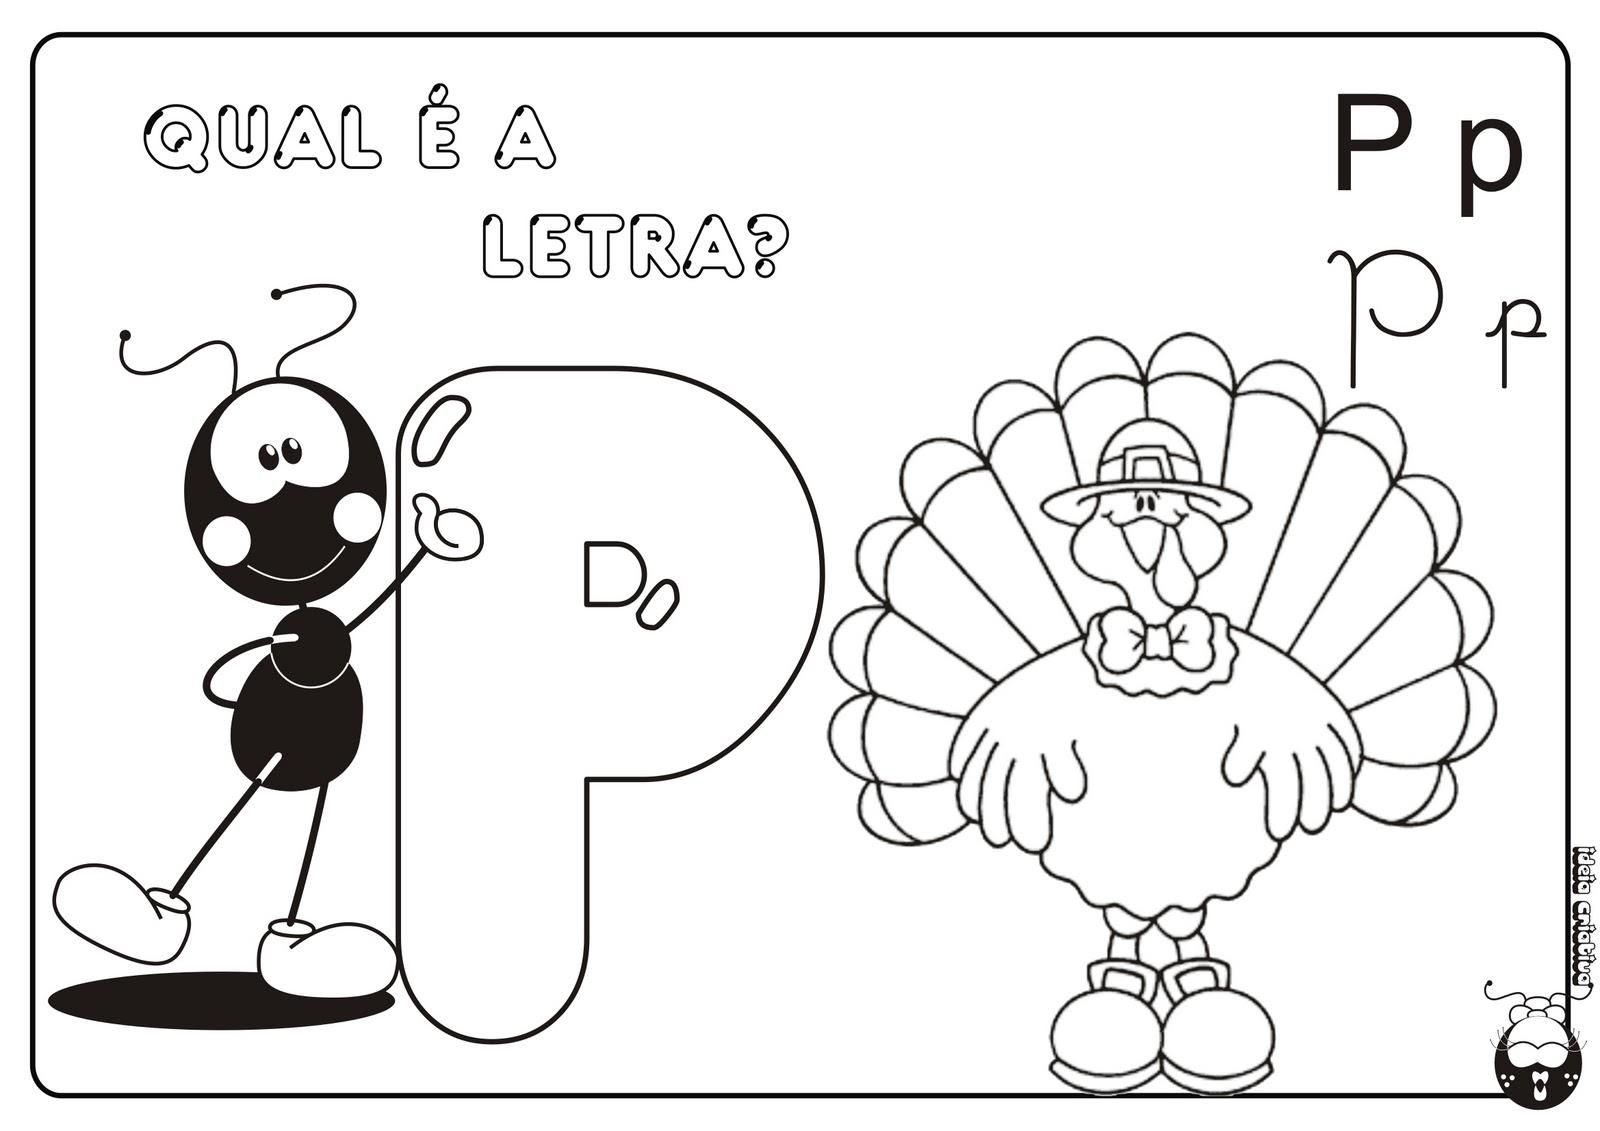 Alfabeto Smilinguido 4 tipos de letra para Baixar Grátis Letra p